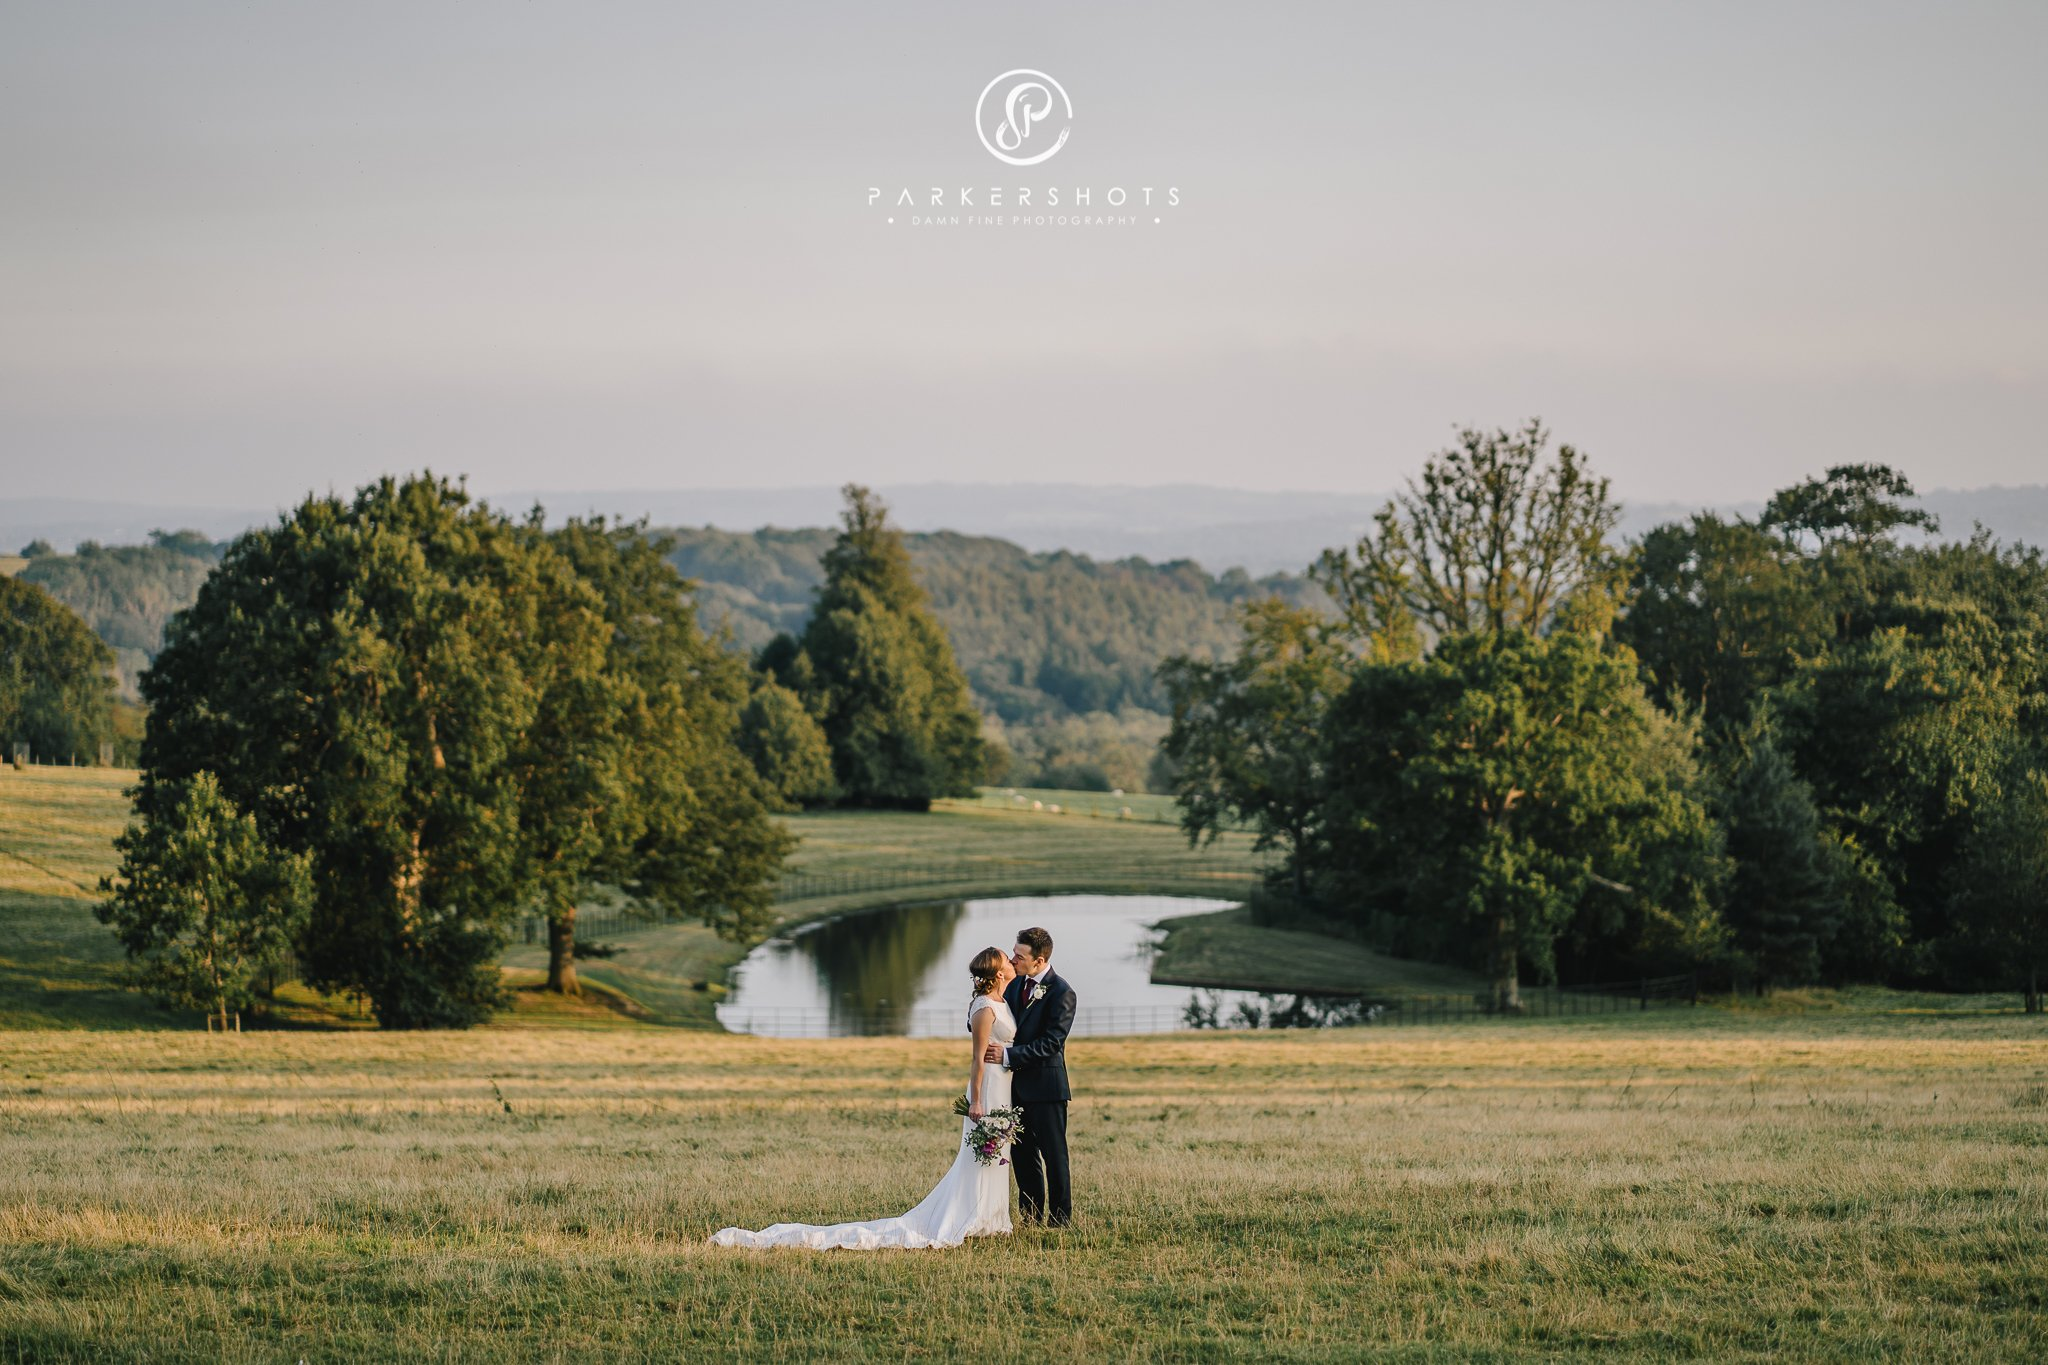 Wadhurst Castle wedding photographer - Becky & Dom's wedding